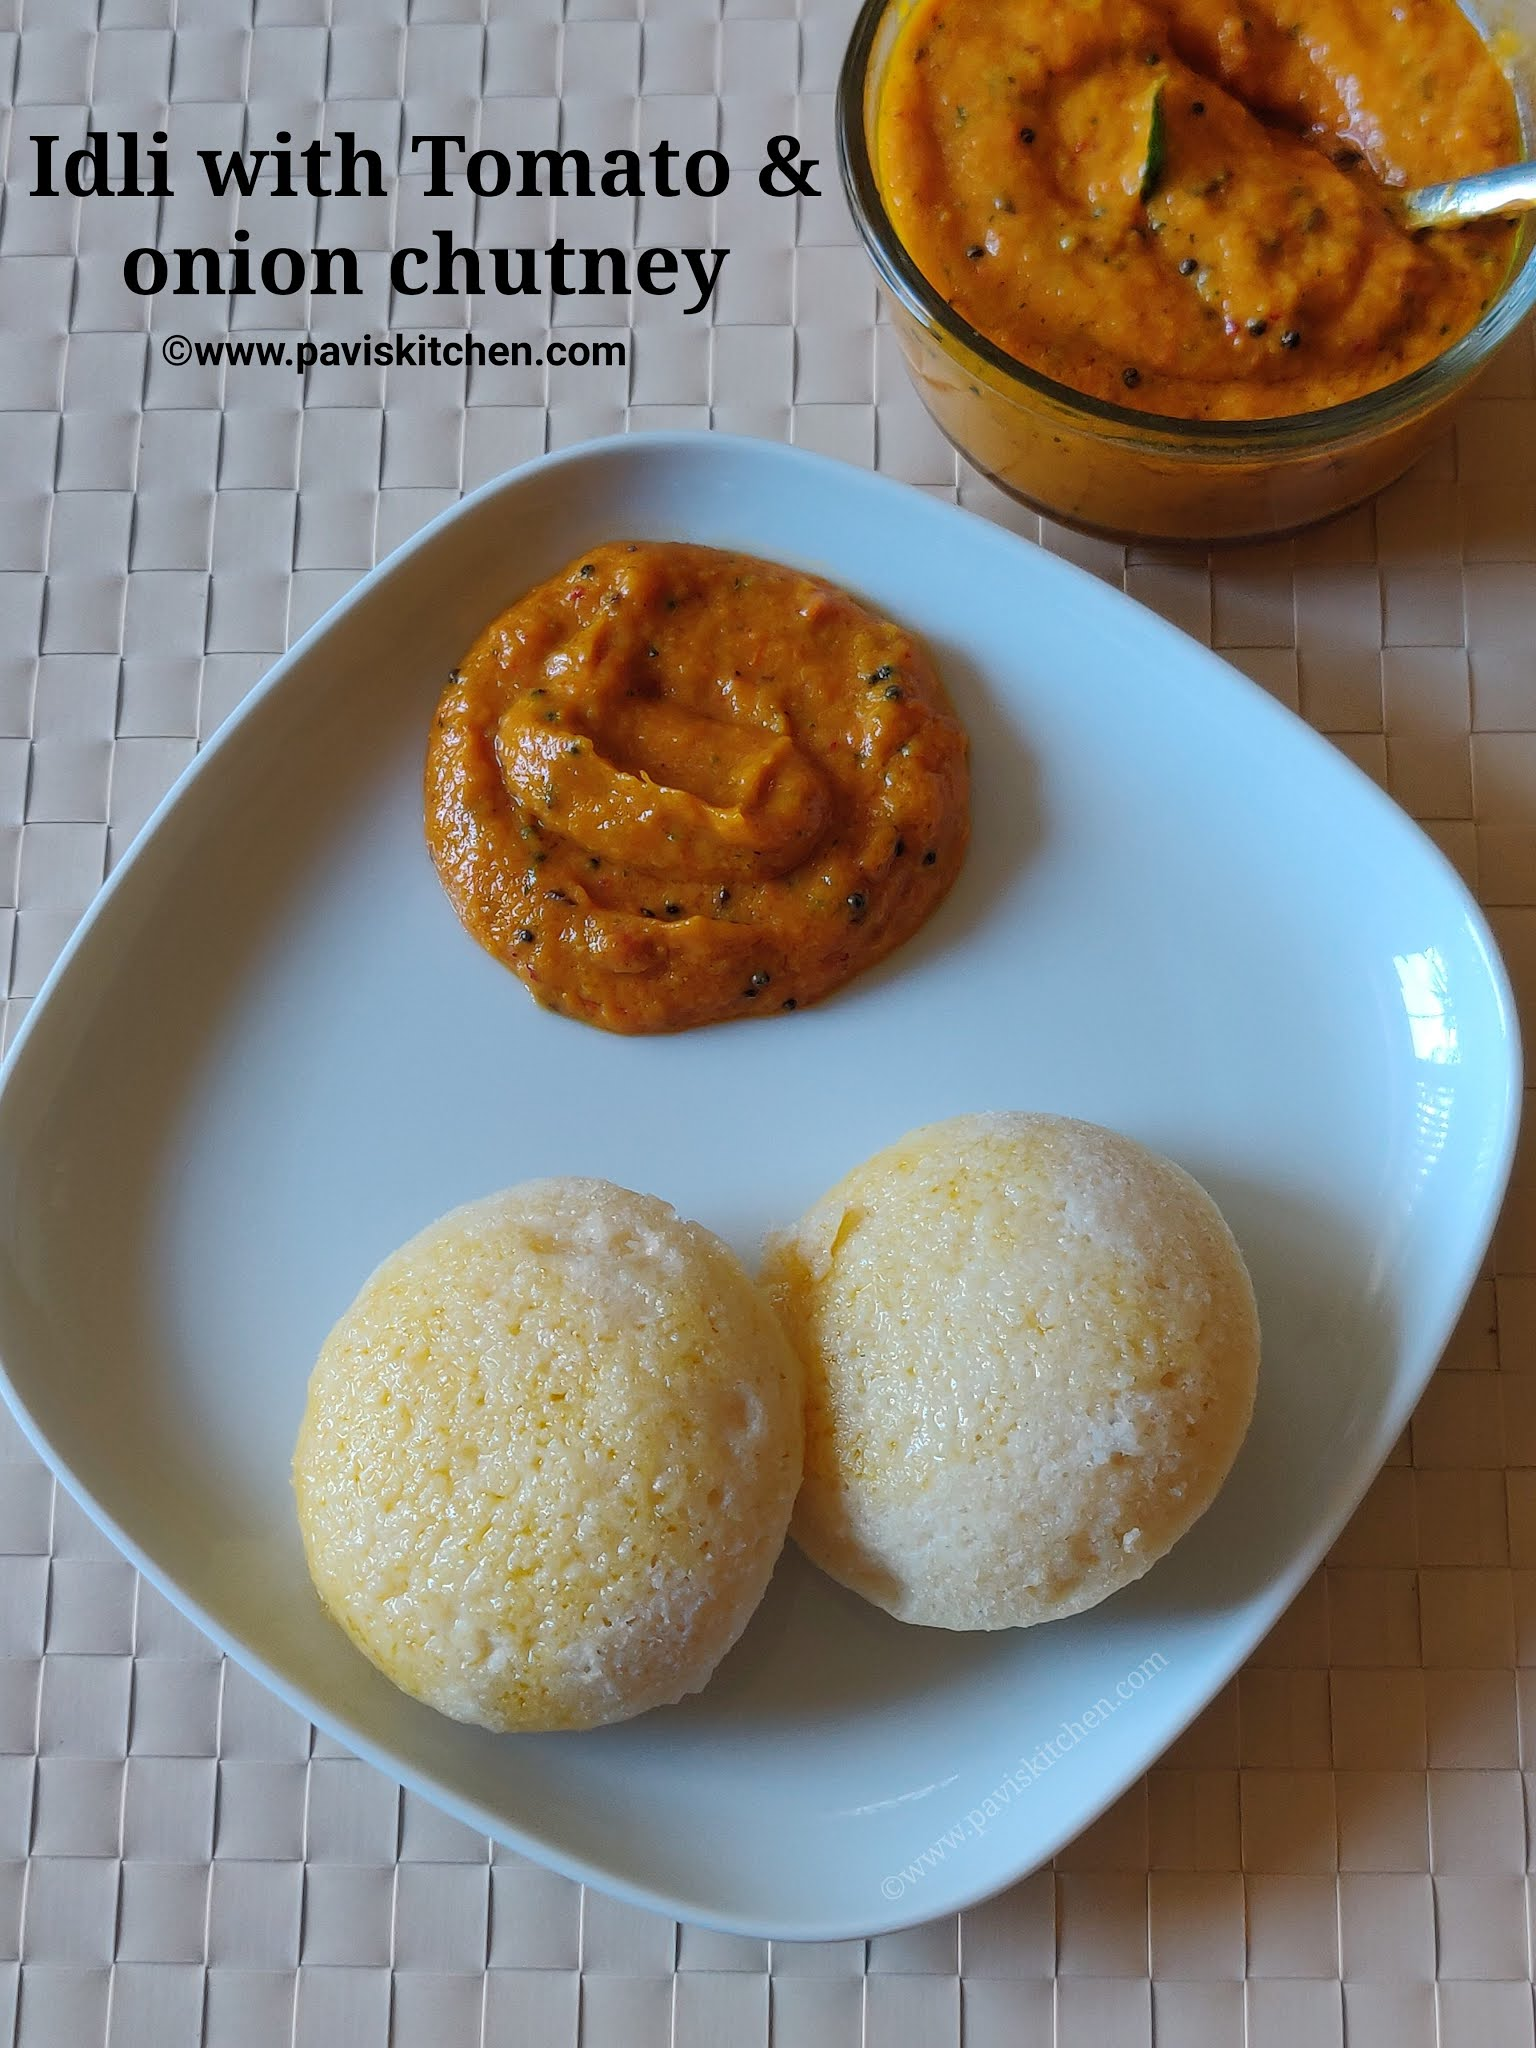 Onion tomato chutney recipe | Tomato onion chutney recipe | South Indian Thakali vengaya chutney